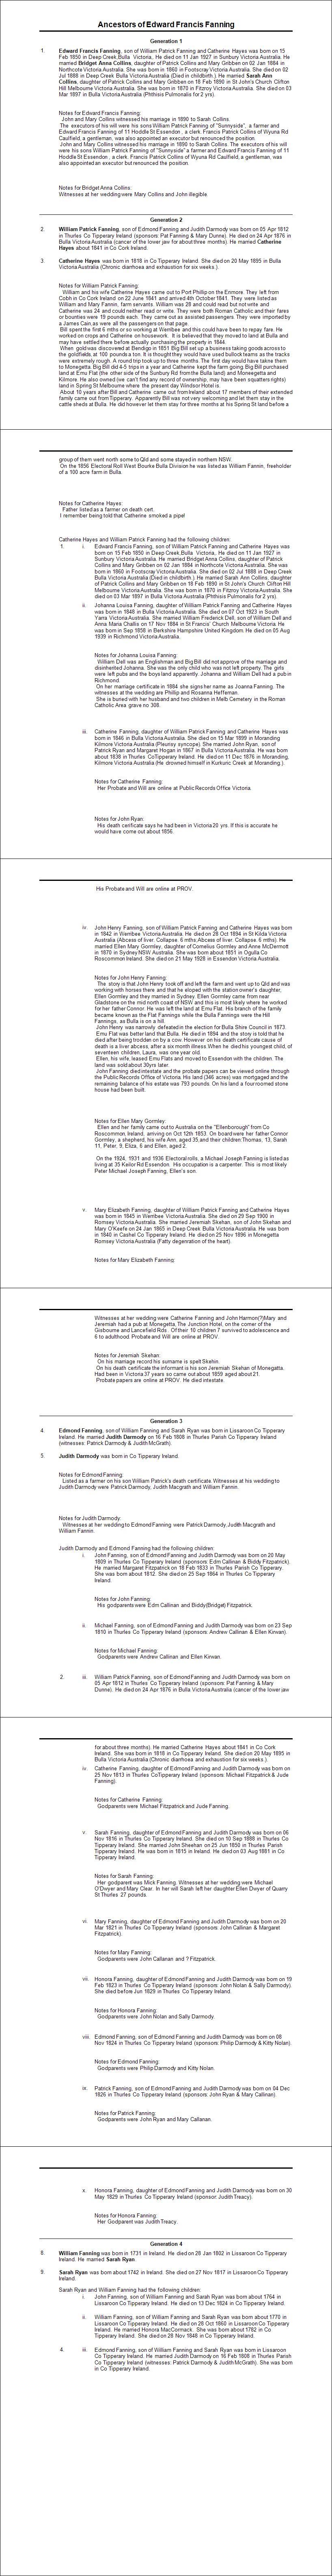 Edward Francis Fanning 1850-1927 Ancestor Report 2015